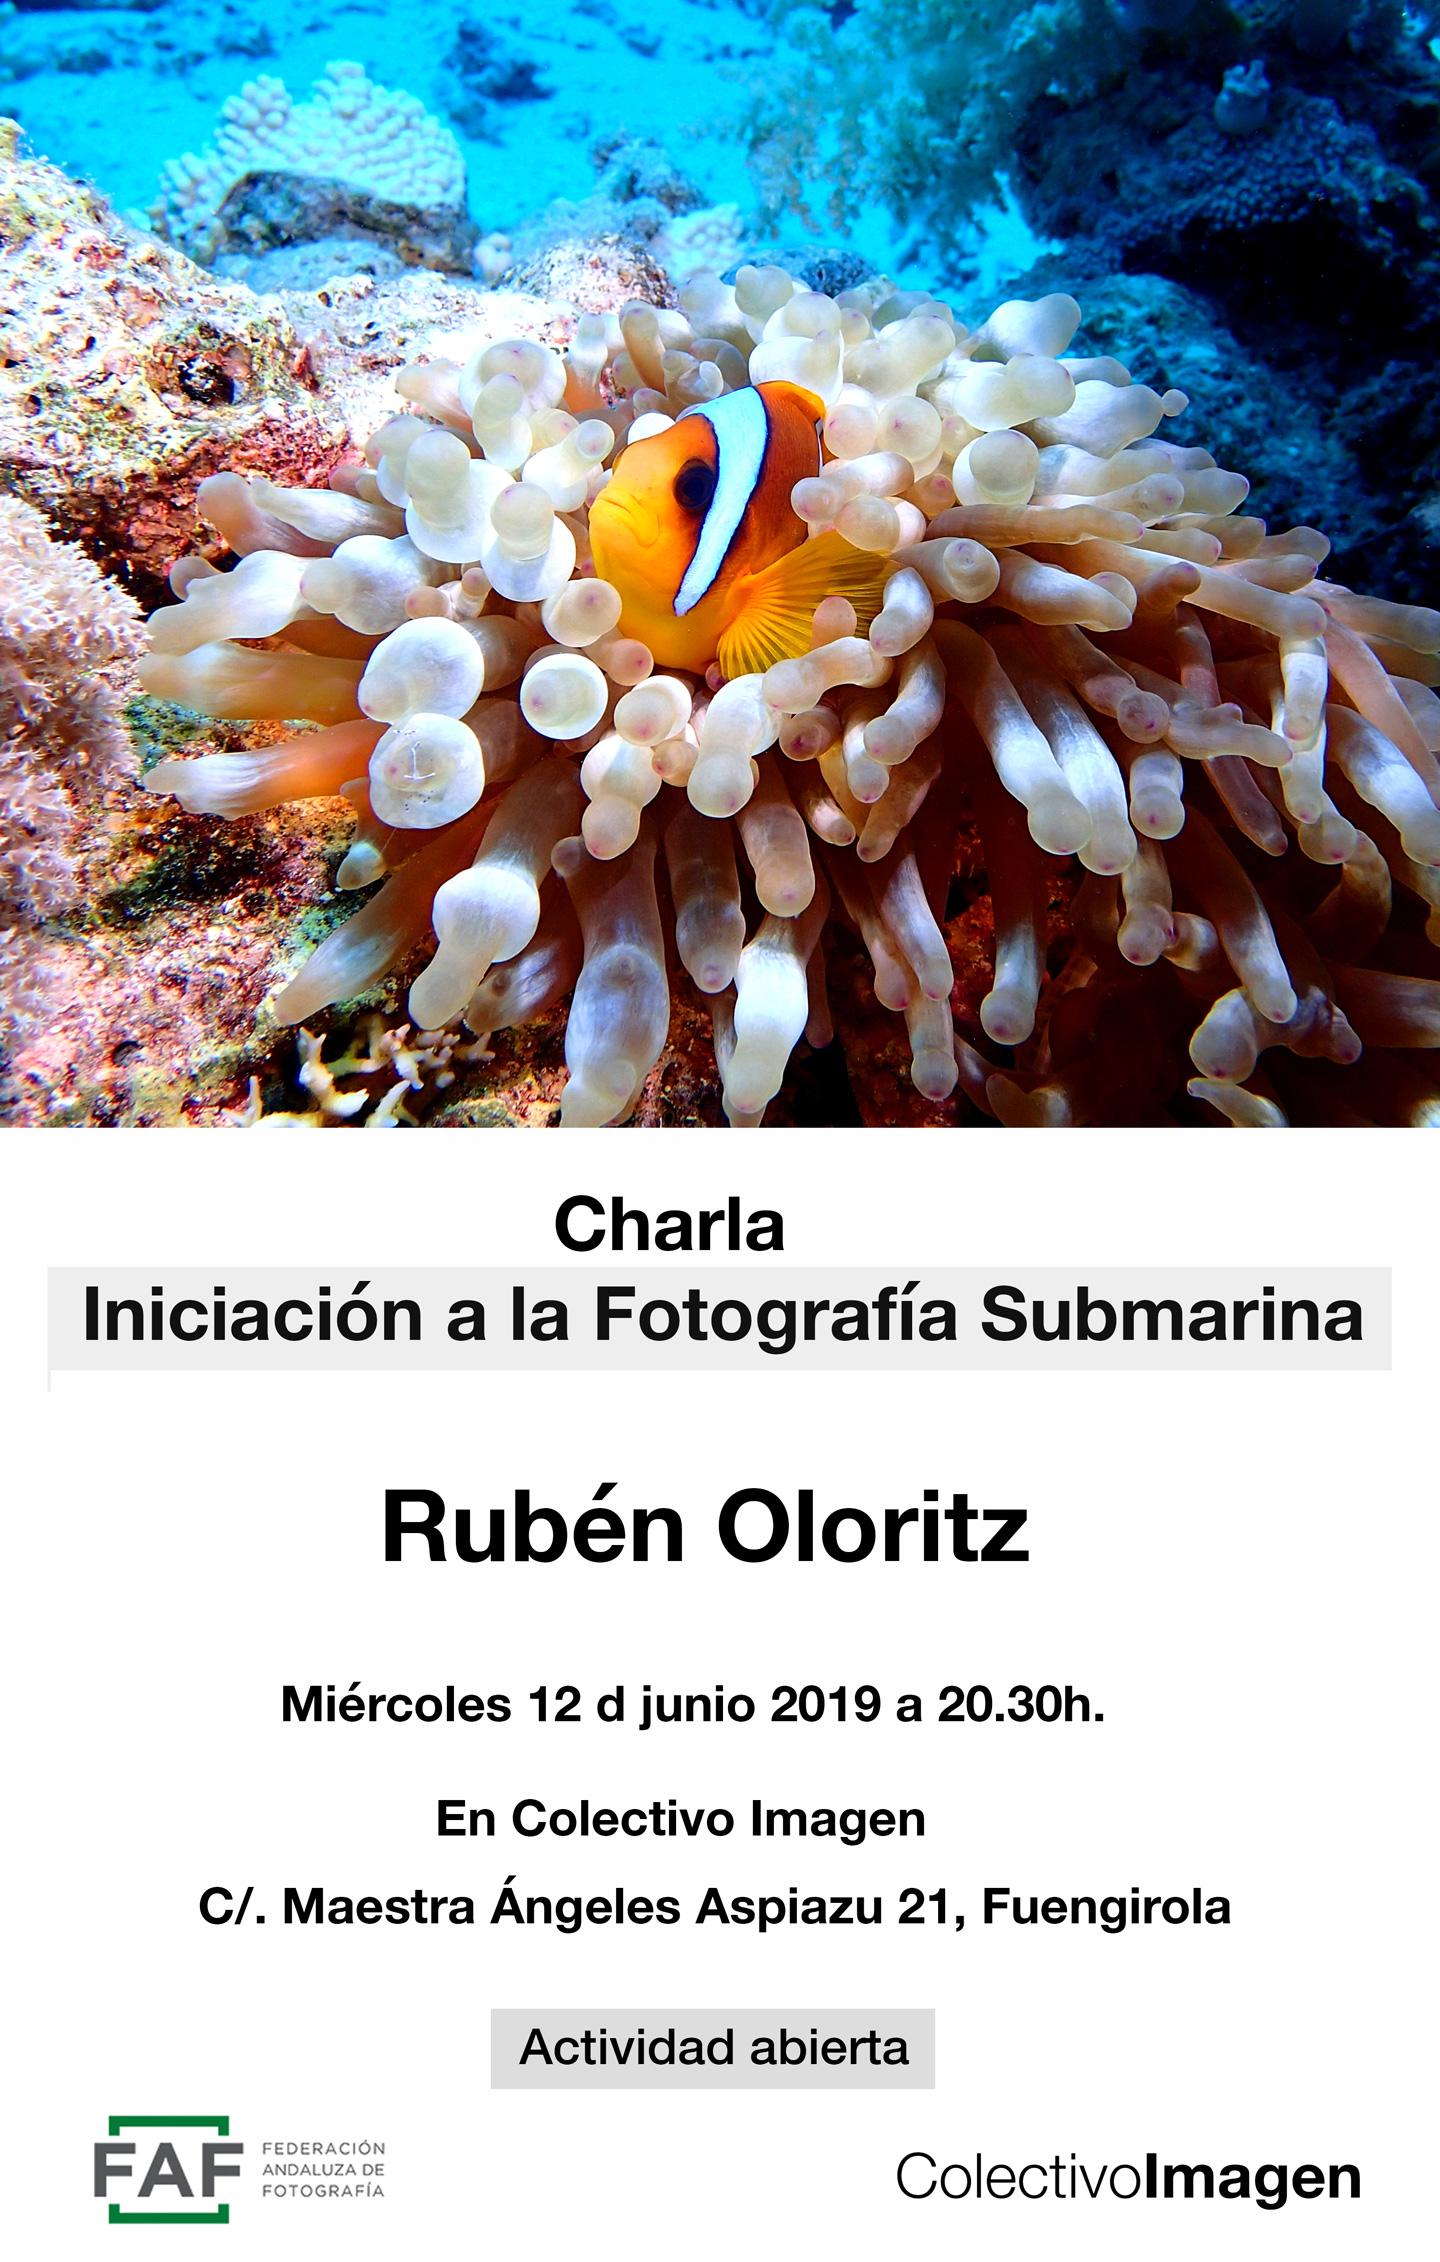 Iniciación a la fotografía submarina, Rubén Oloritz